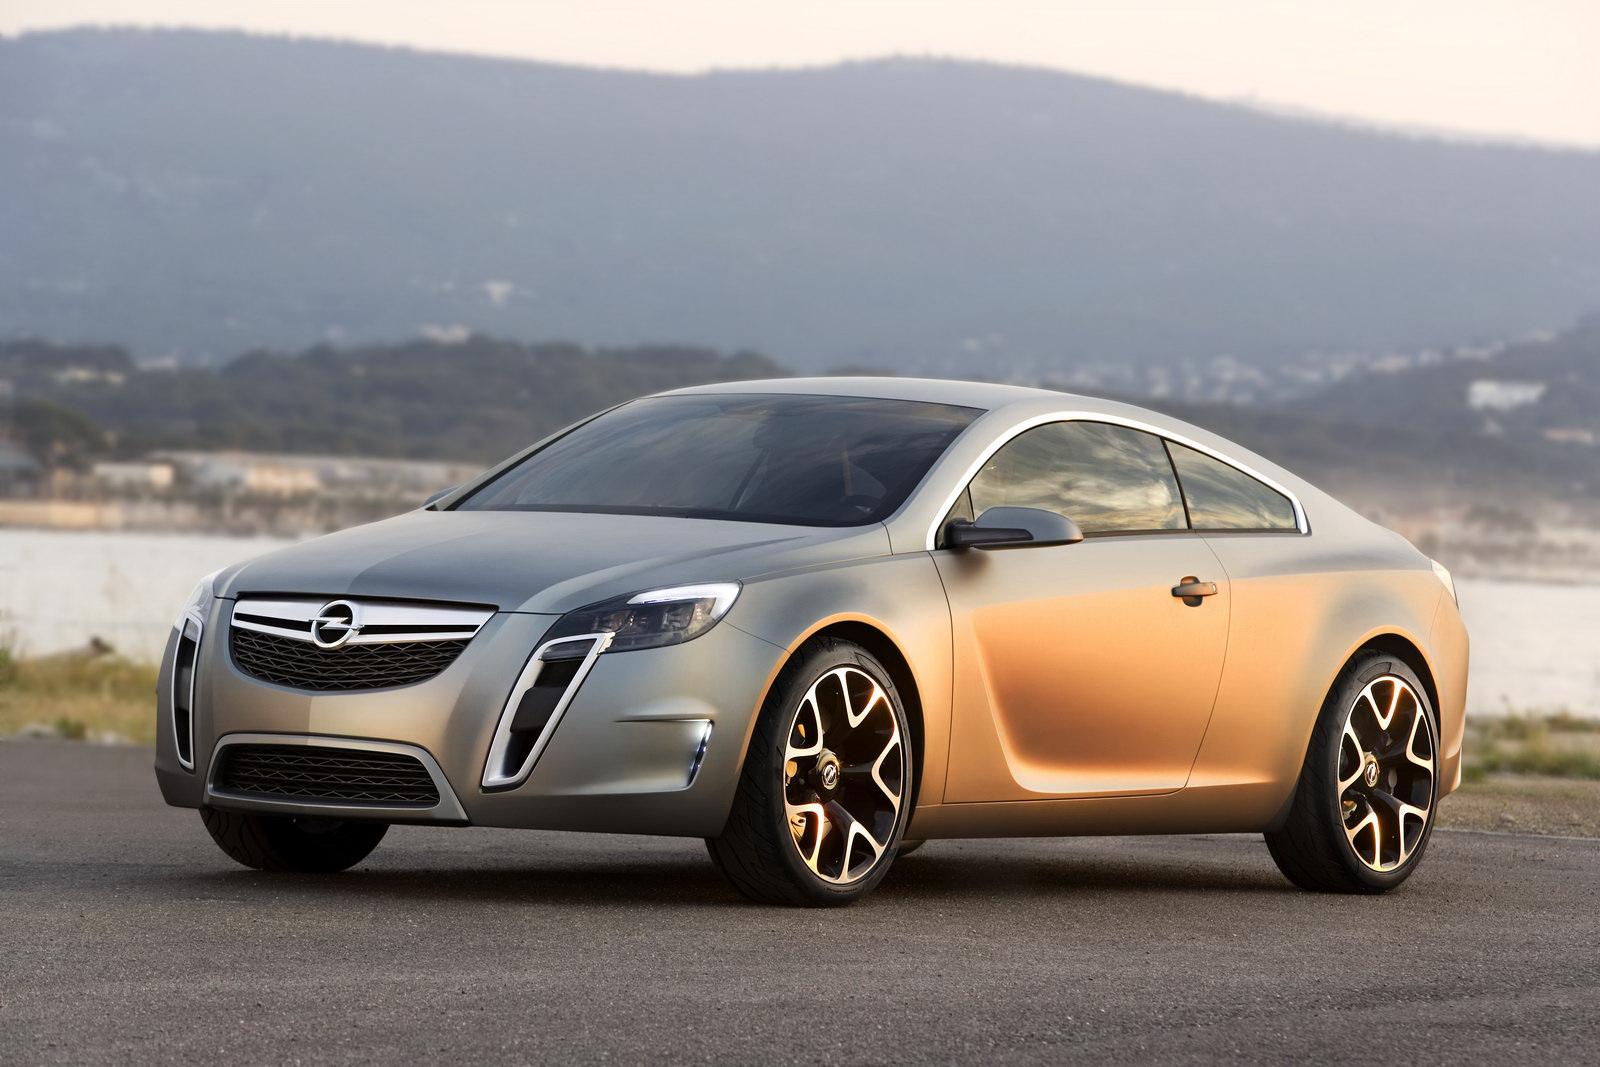 breaking, der neue Opel Calibra, Vauxhall Calibra, Tim Tozer, Monza concept, Comeback, MonzaConcept, Opel, Opel Calibra, Opel GTC, Opel GTC concept, Opel GTC Concept 2007